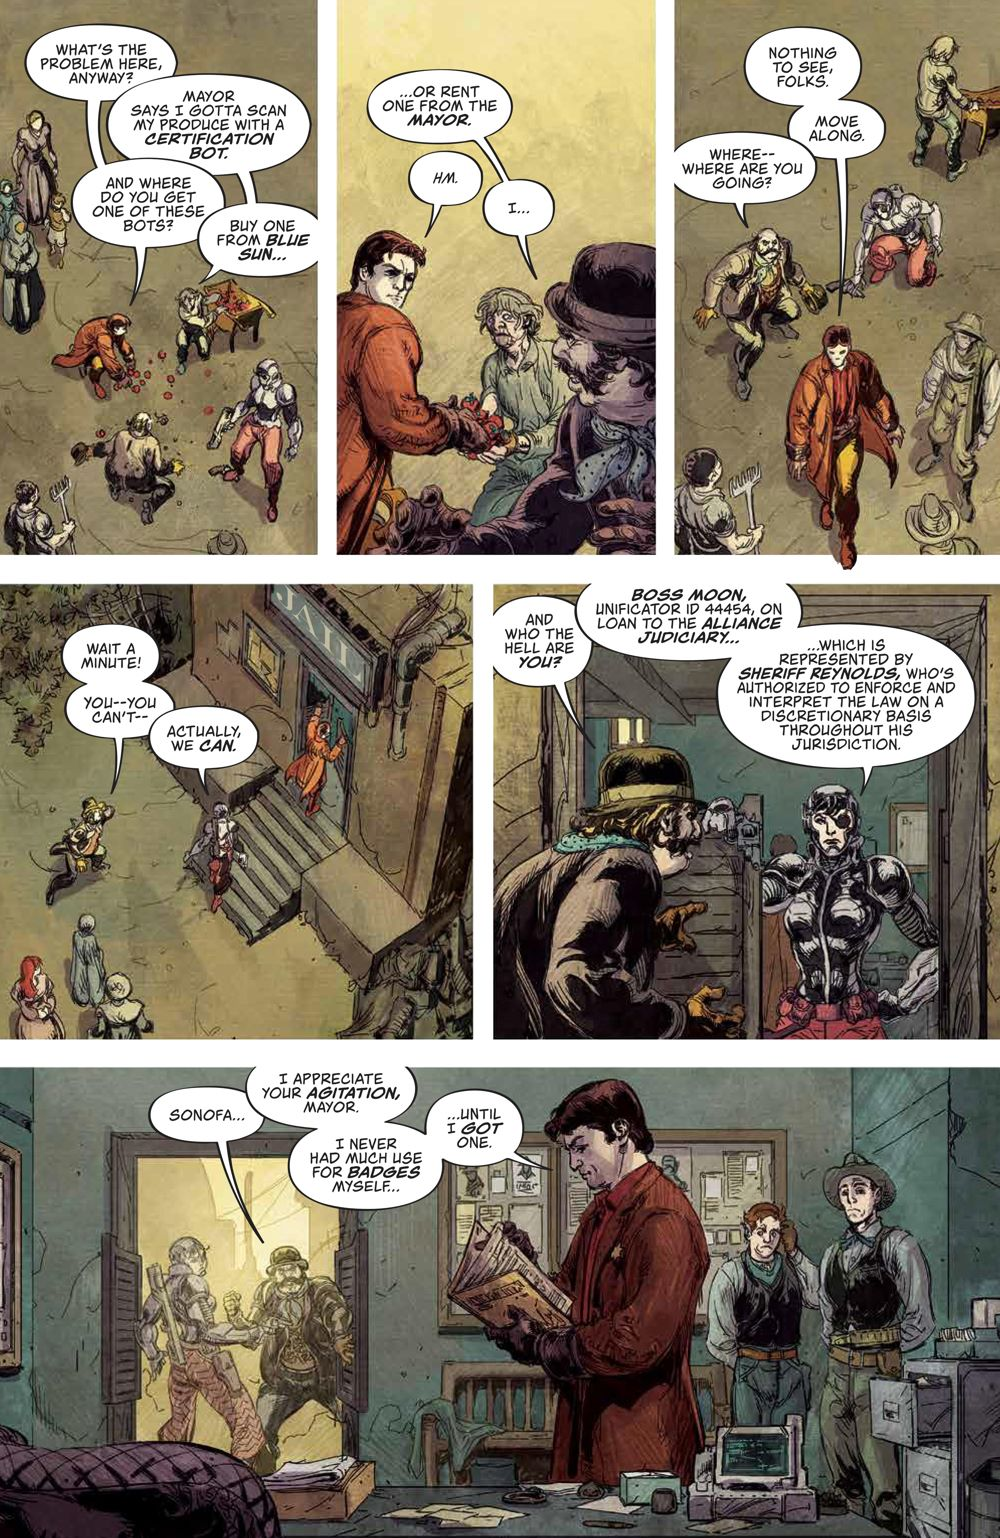 Firefly_NewSheriffVerse_v1_HC_PRESS_56 ComicList Previews: FIREFLY NEW SHERIFF IN THE 'VERSE VOLUME 1 HC